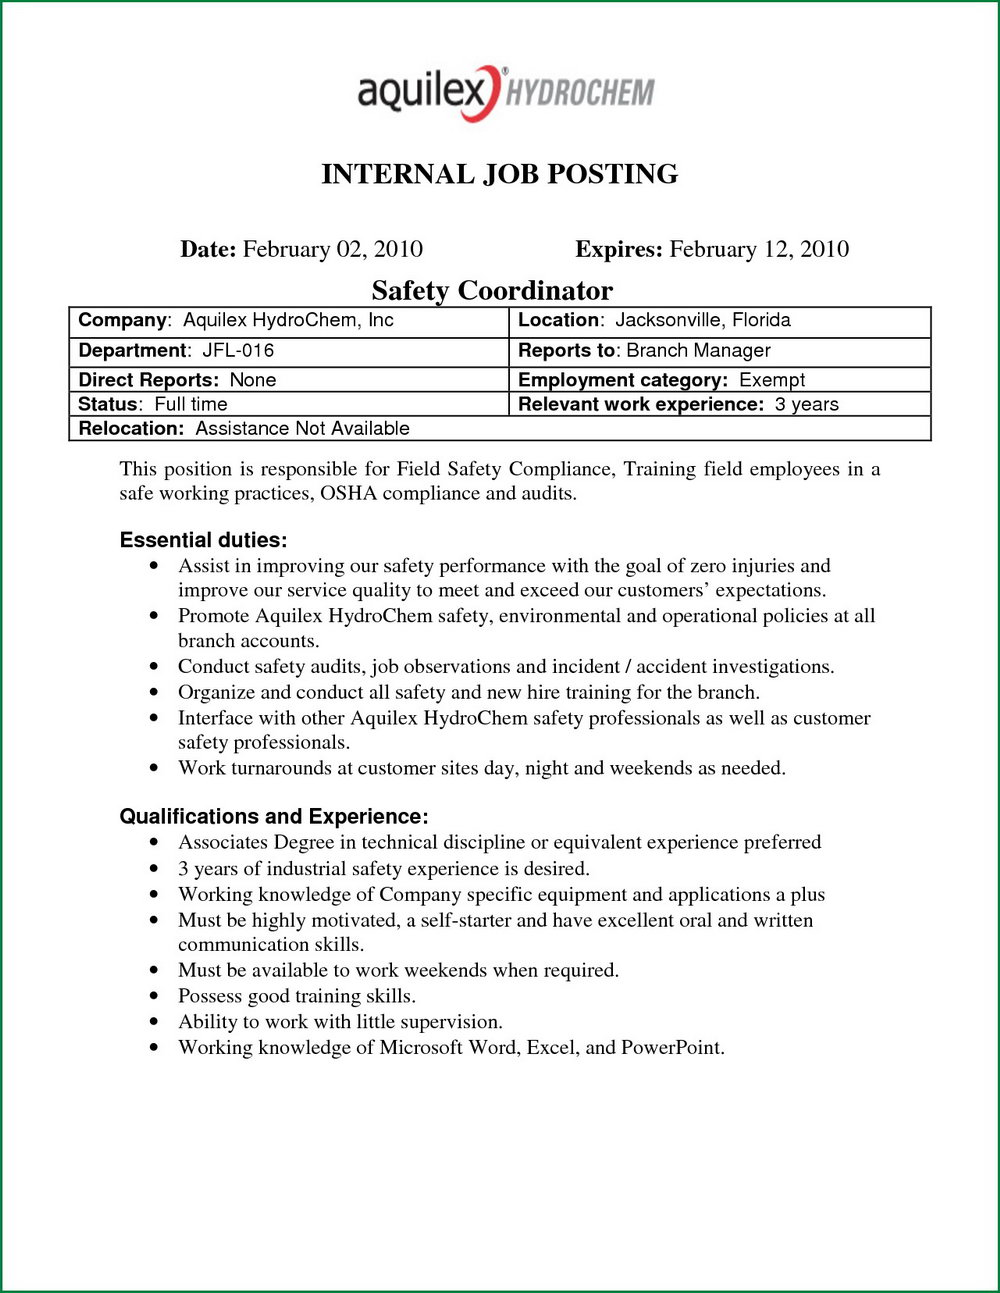 Internal Job Posting Template Word